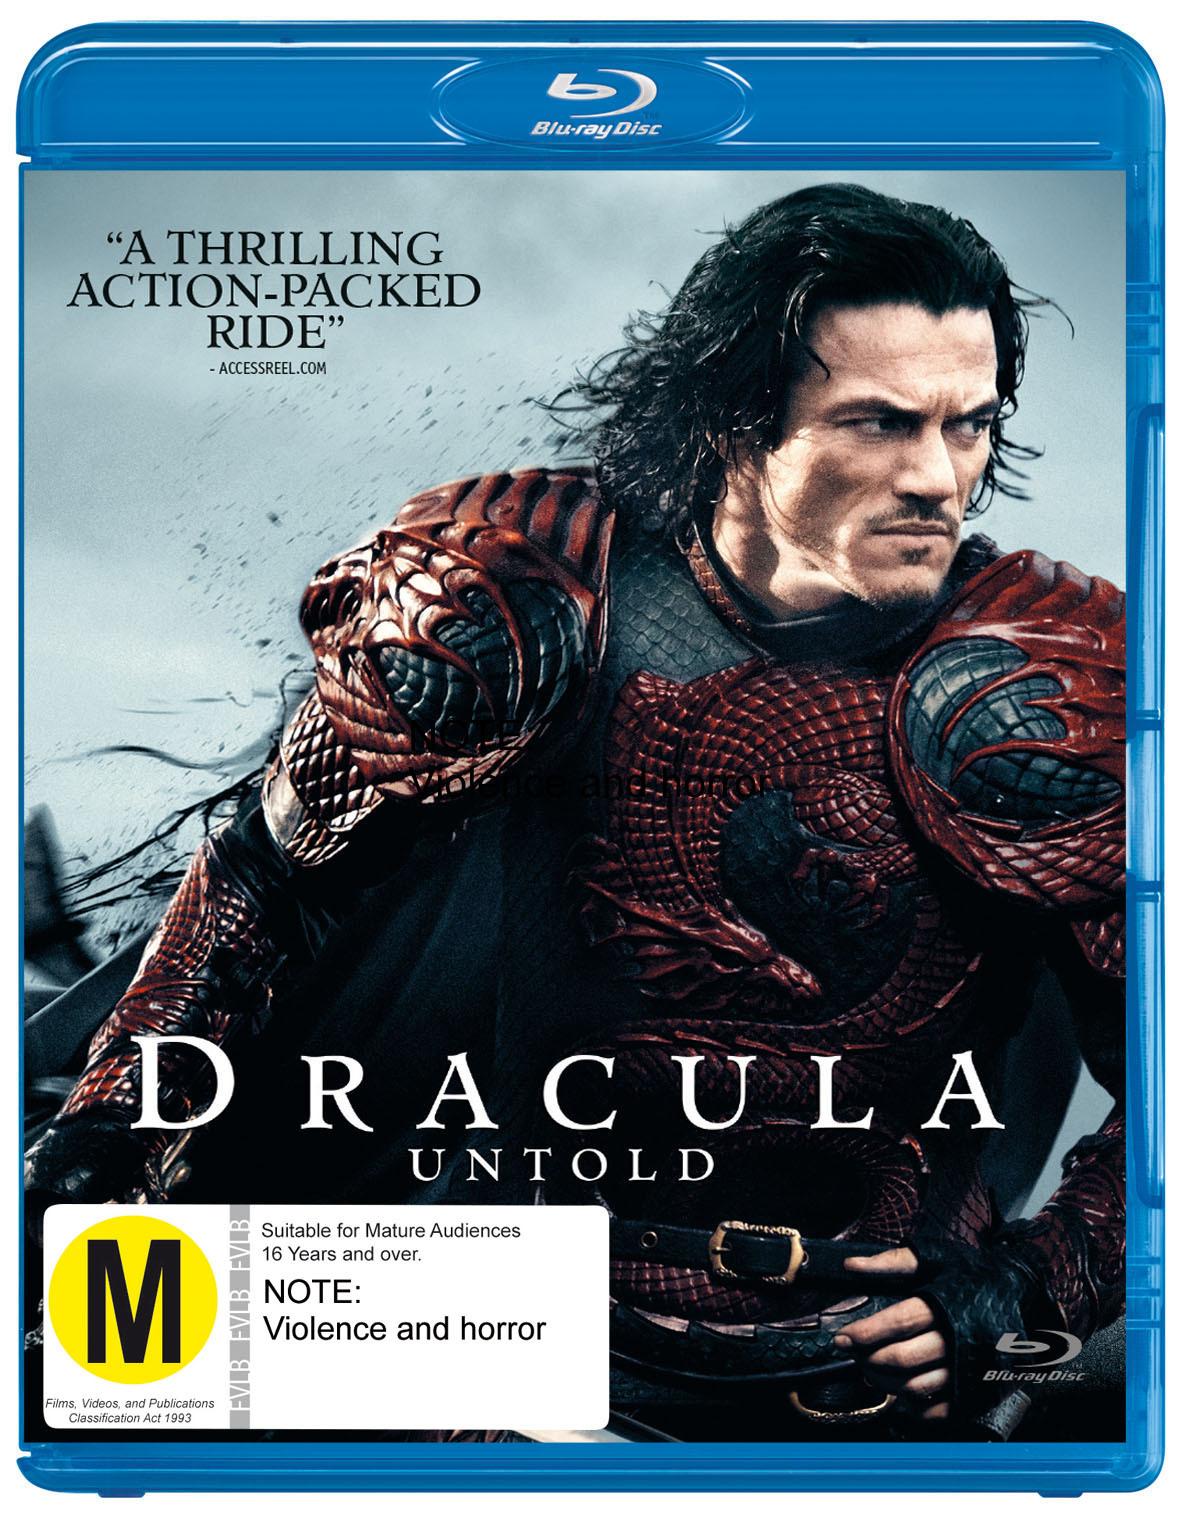 Dracula Untold on Blu-ray image